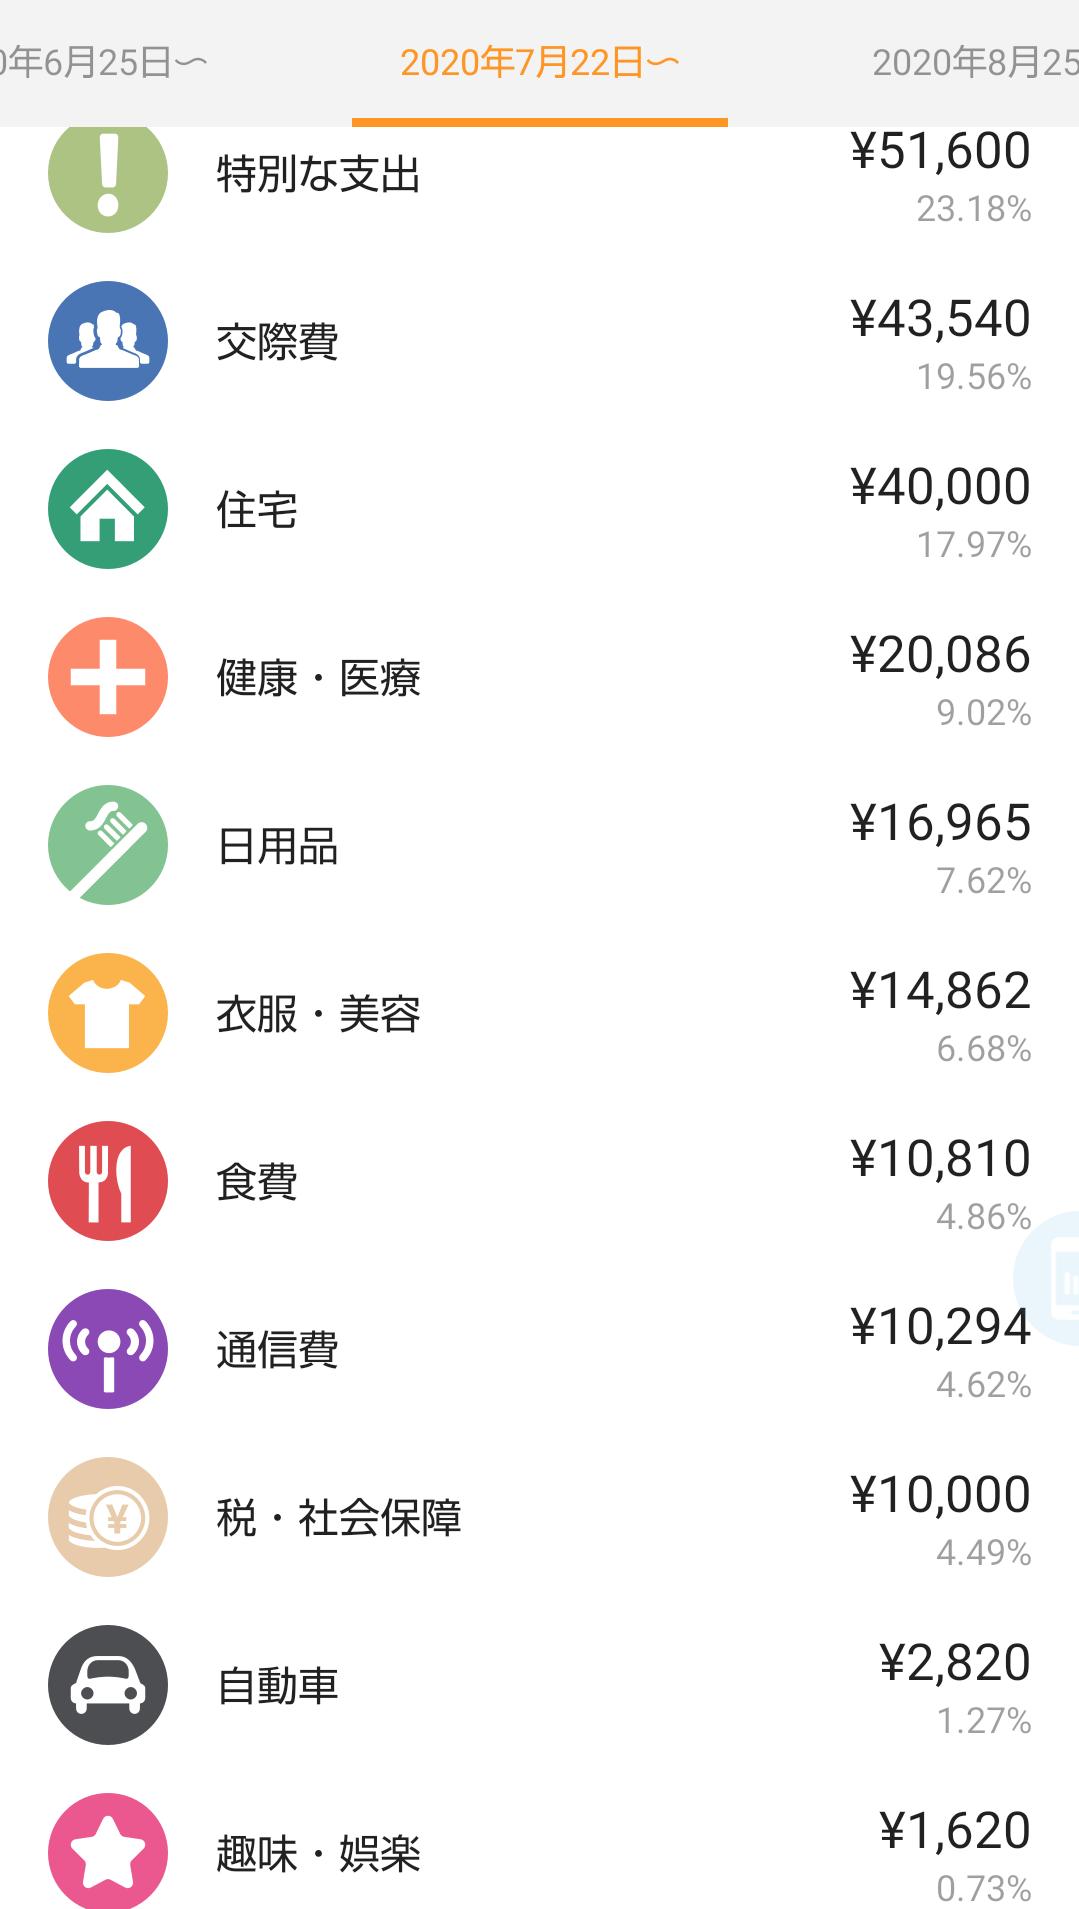 20200825money.png